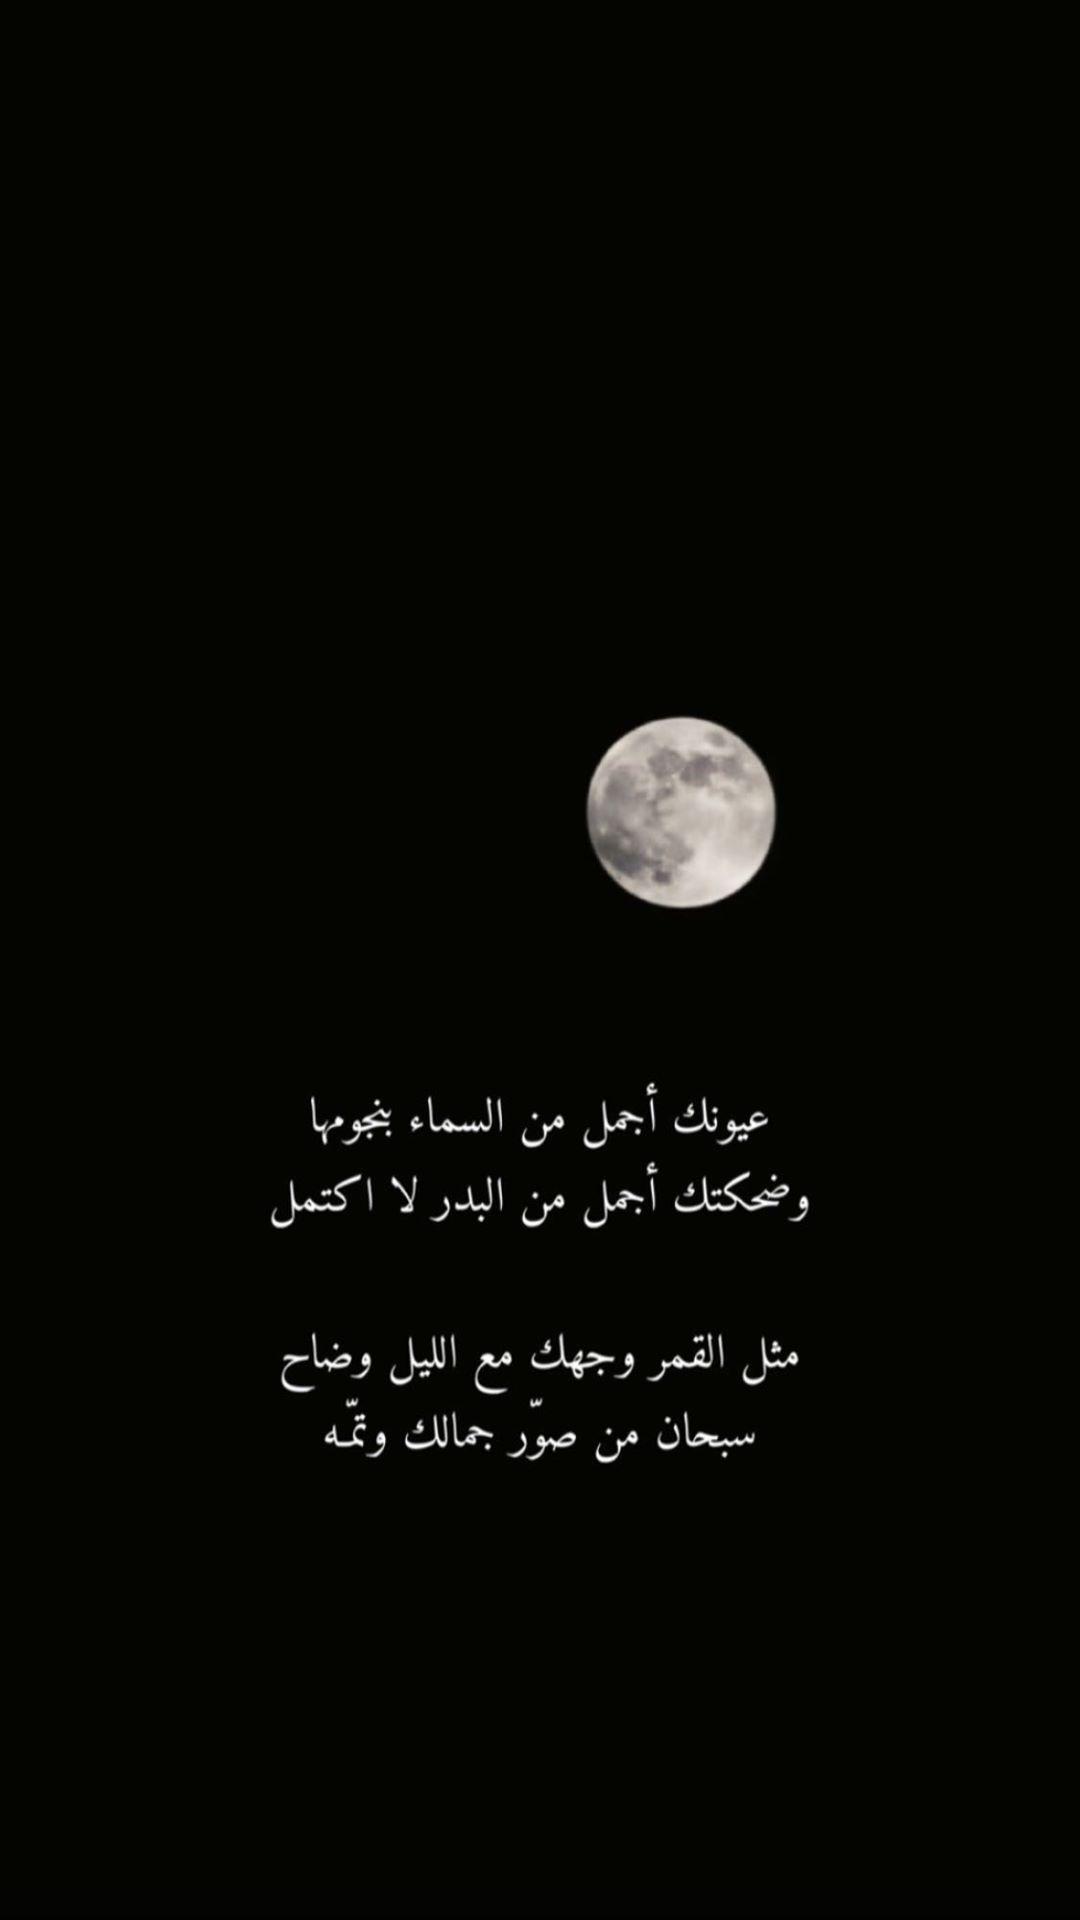 Pin By Rawan Rakan On Qoutes Quran Quotes Inspirational Laughing Quotes Love Quotes Wallpaper